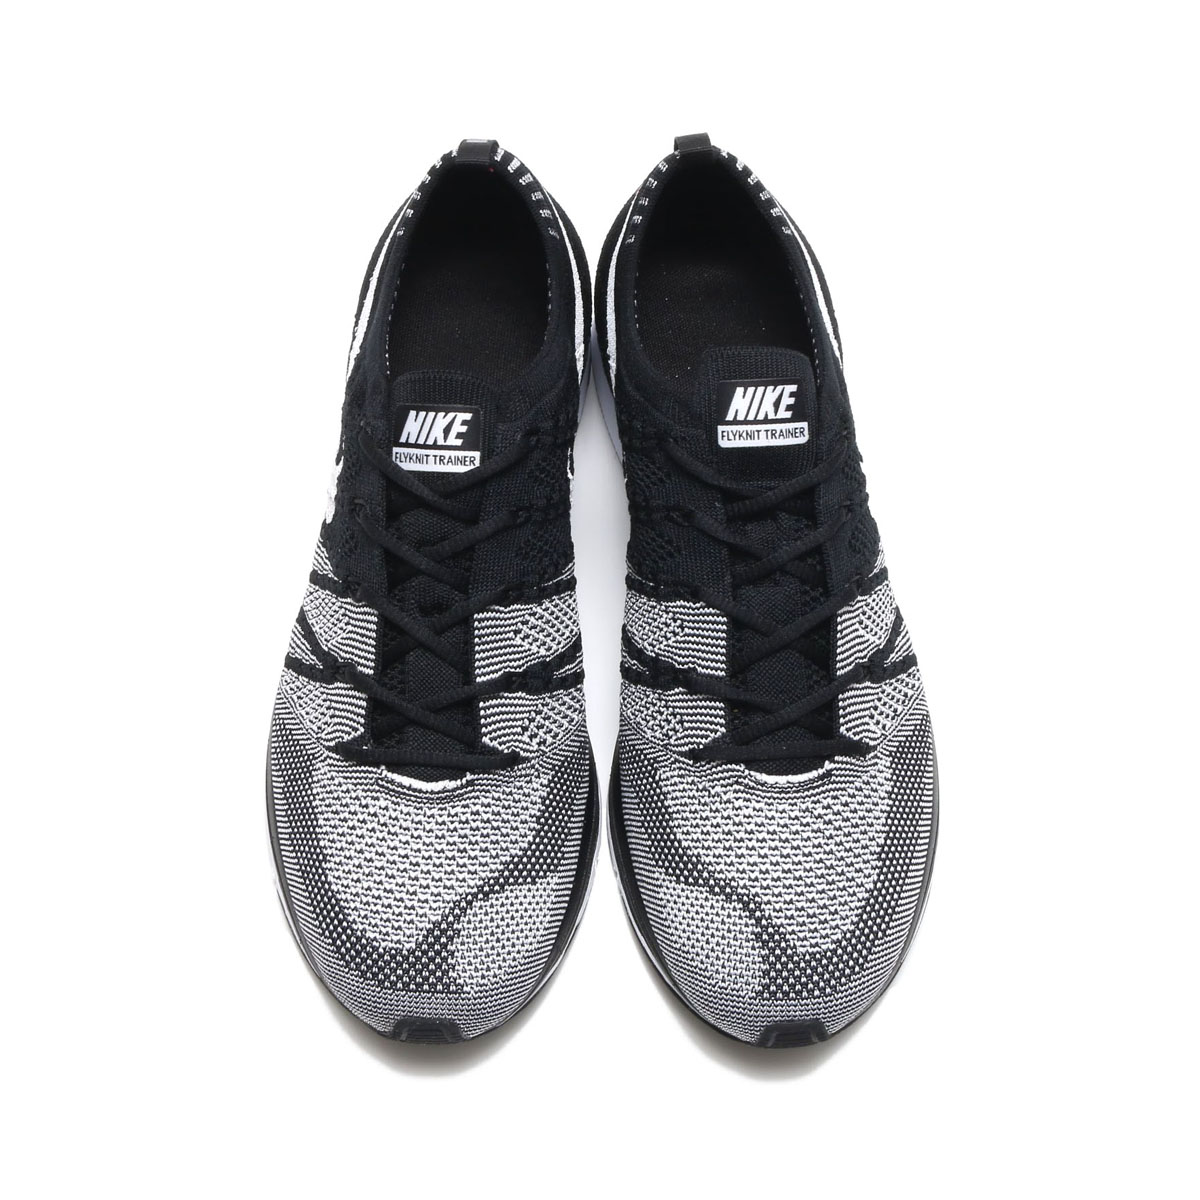 048e7d9cd2e7 NIKE FLYKNIT TRAINER (Nike fried food knit trainer) (BLACK WHITE-WHITE) 18SP -S